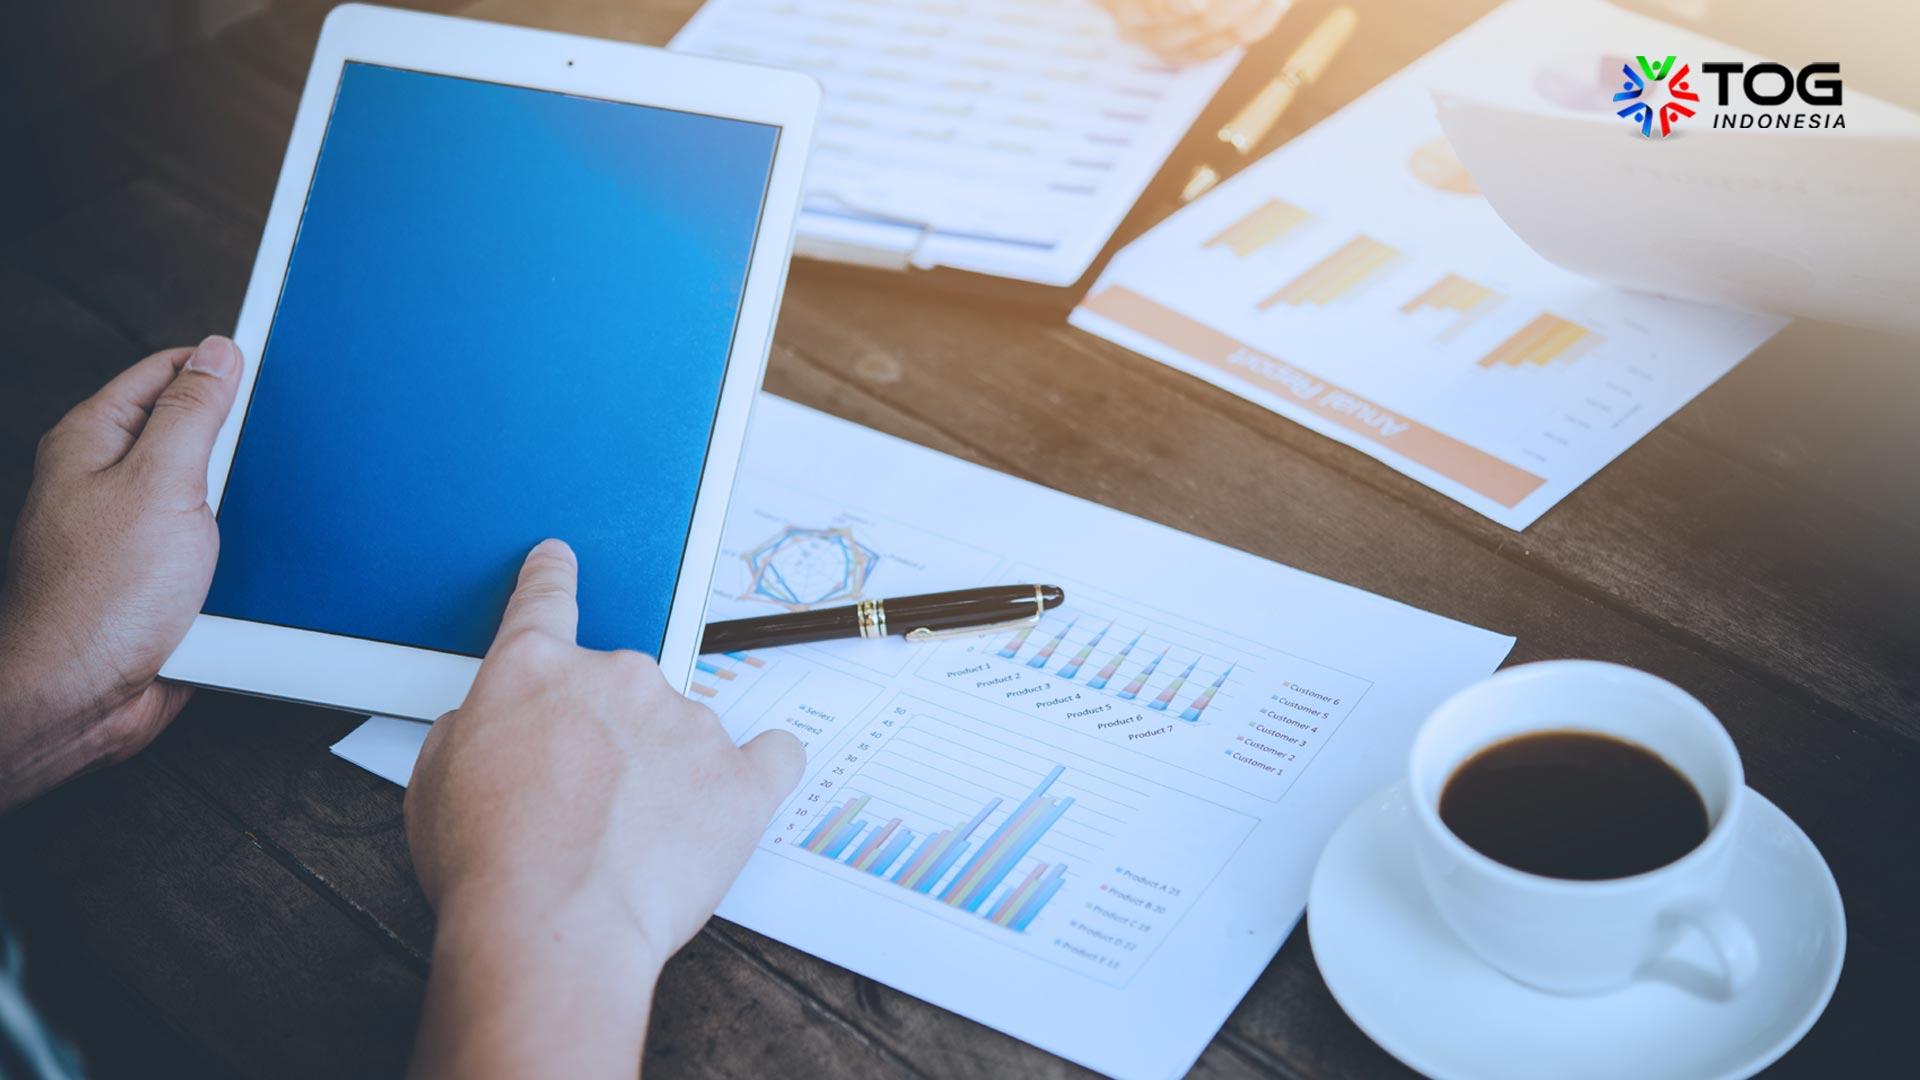 Mau Jadi Data Analytics yang Andal? Kuasai Skill Berikut ini